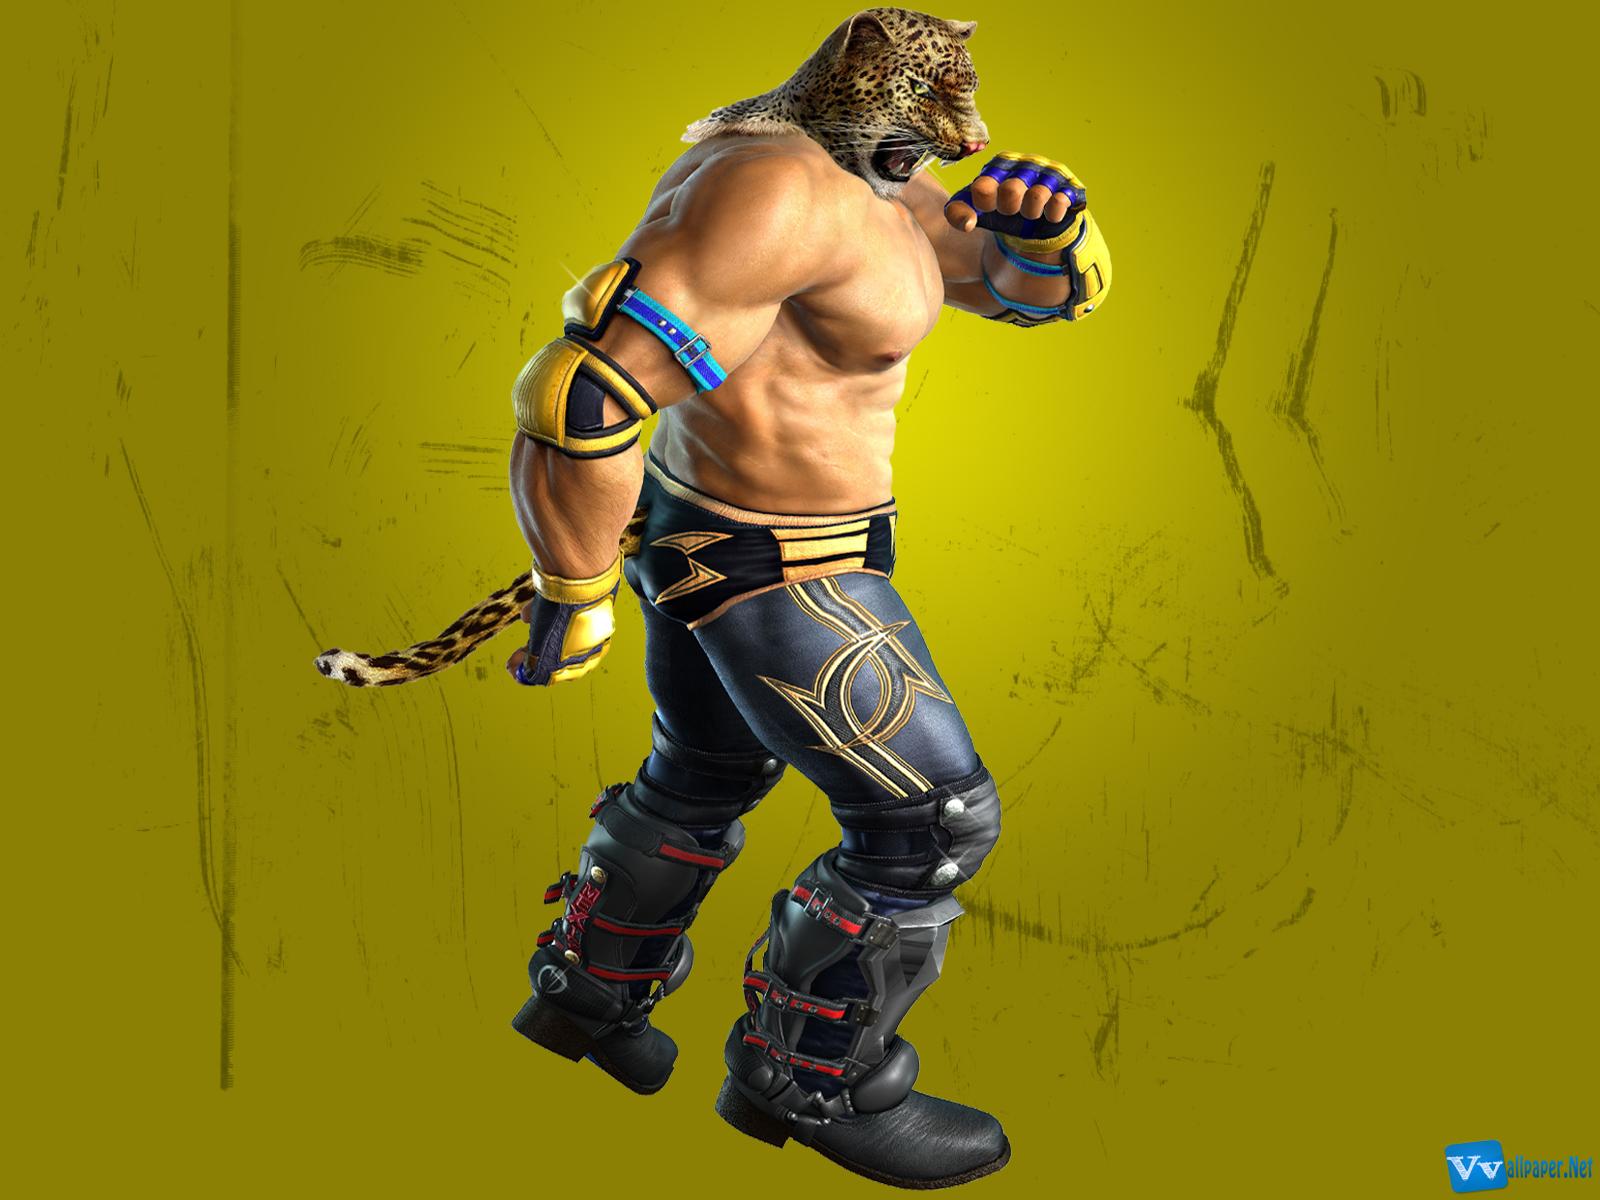 Central Wallpaper Armor King Tekken Hd Wallpapers